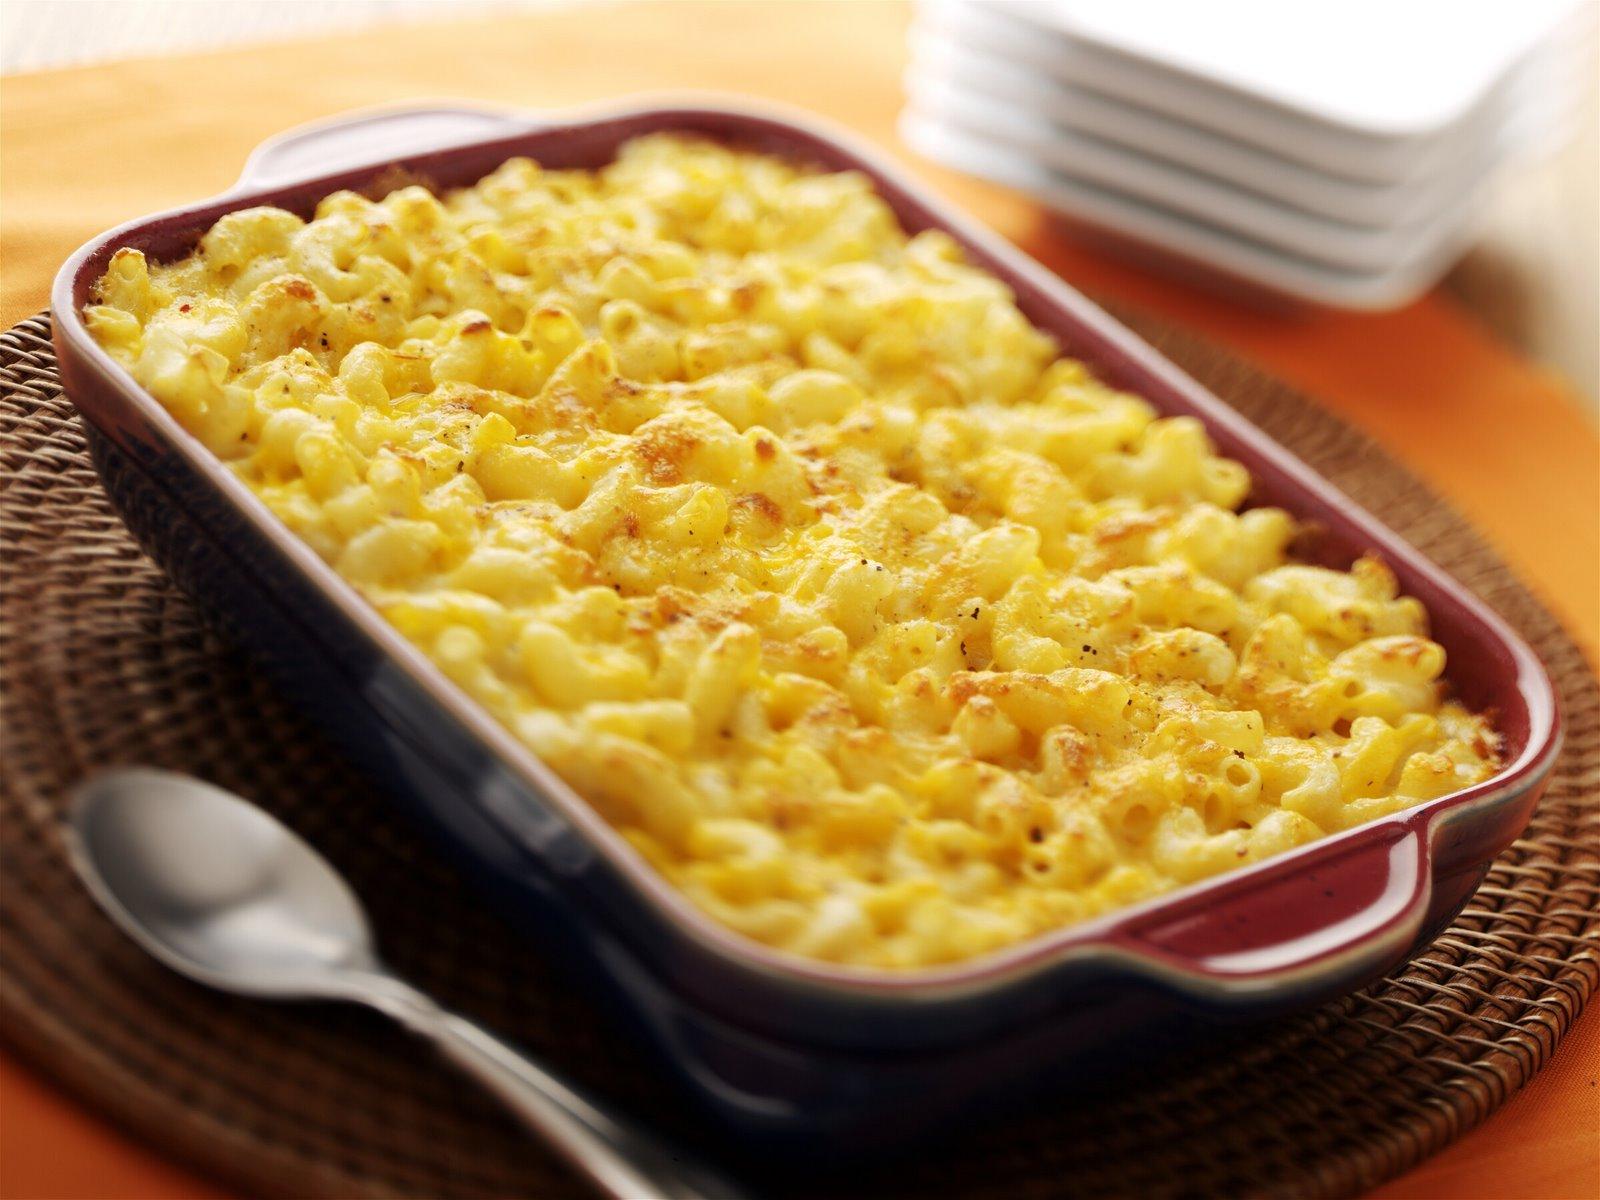 Creamy Mac N' Cheese